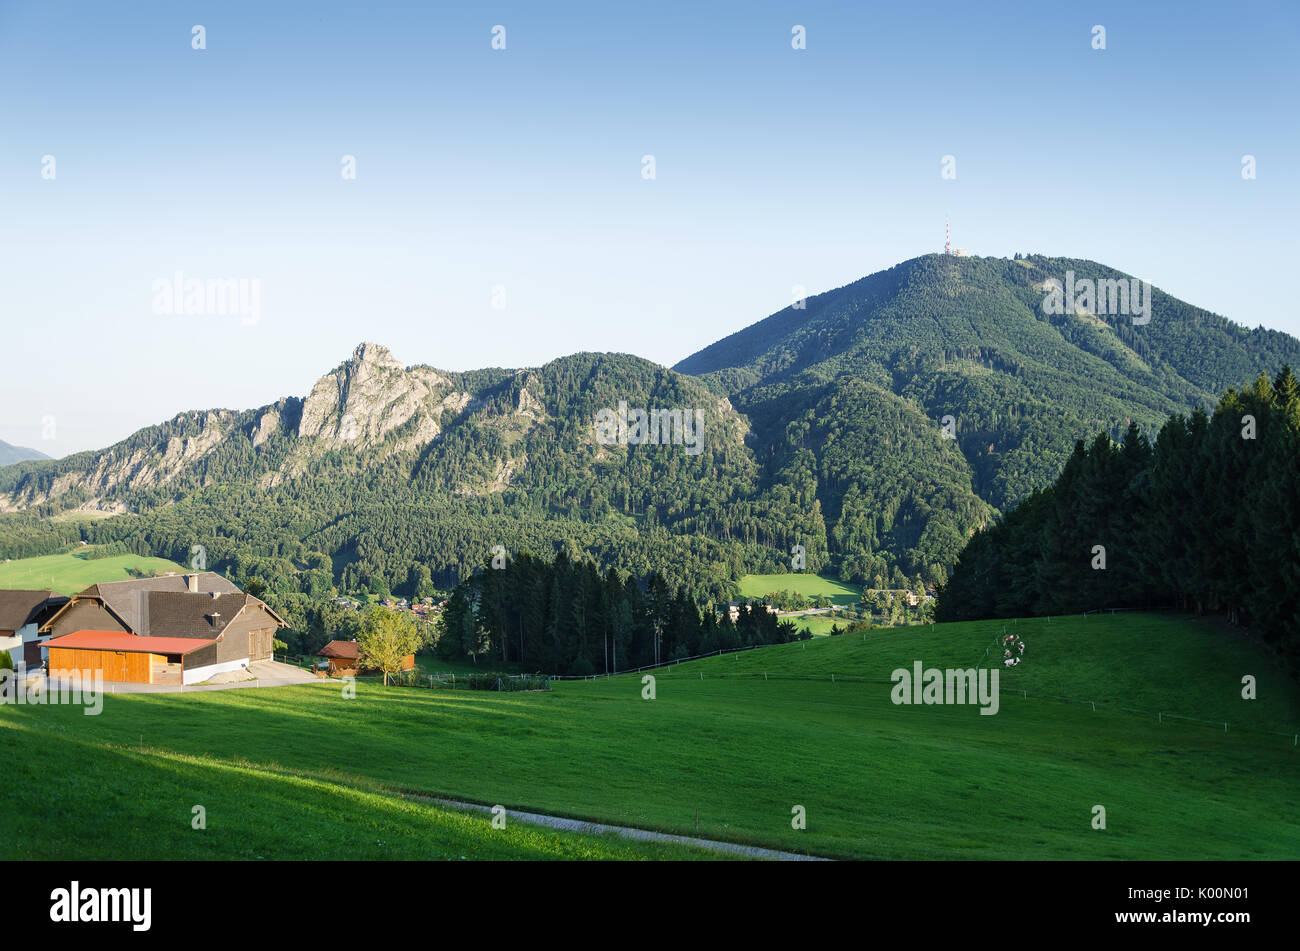 Gaisberg with Nockstein in Austria, Europe. Hausberg of Salzburg. View from Heuberg. Gaisberg belongs to Salzkammergut Mountains. - Stock Image